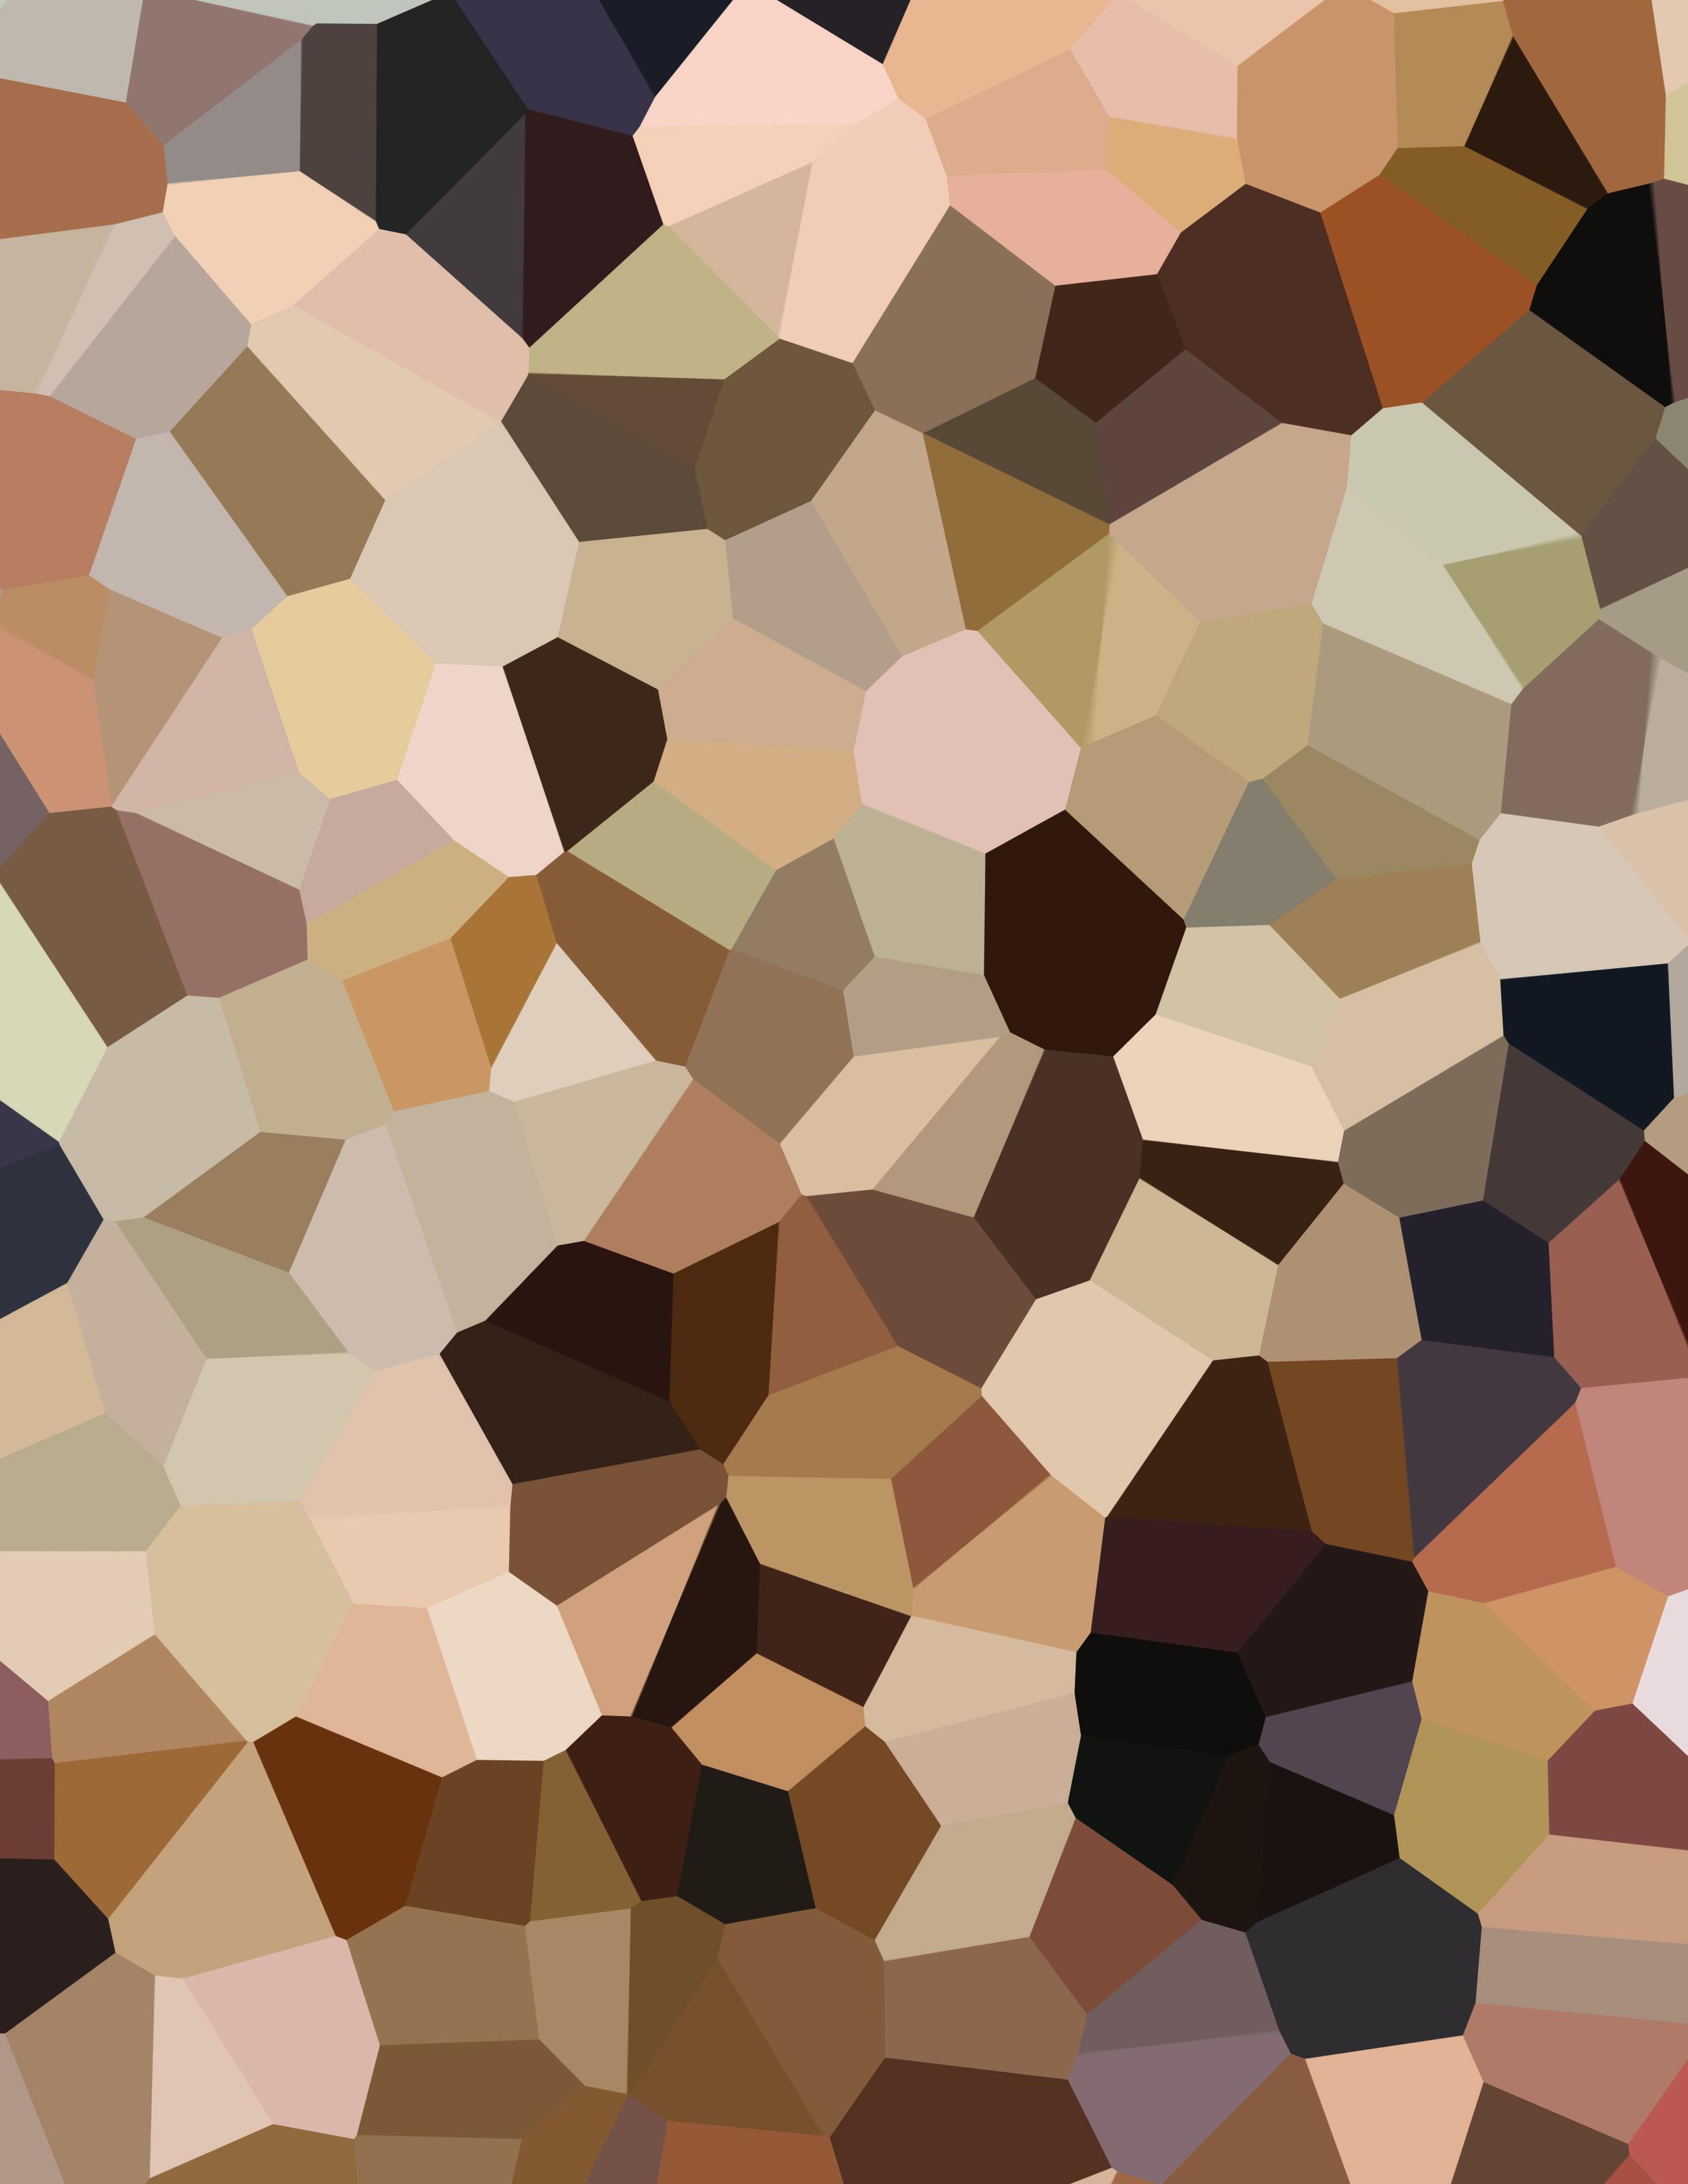 rock_2_mosaic.jpg